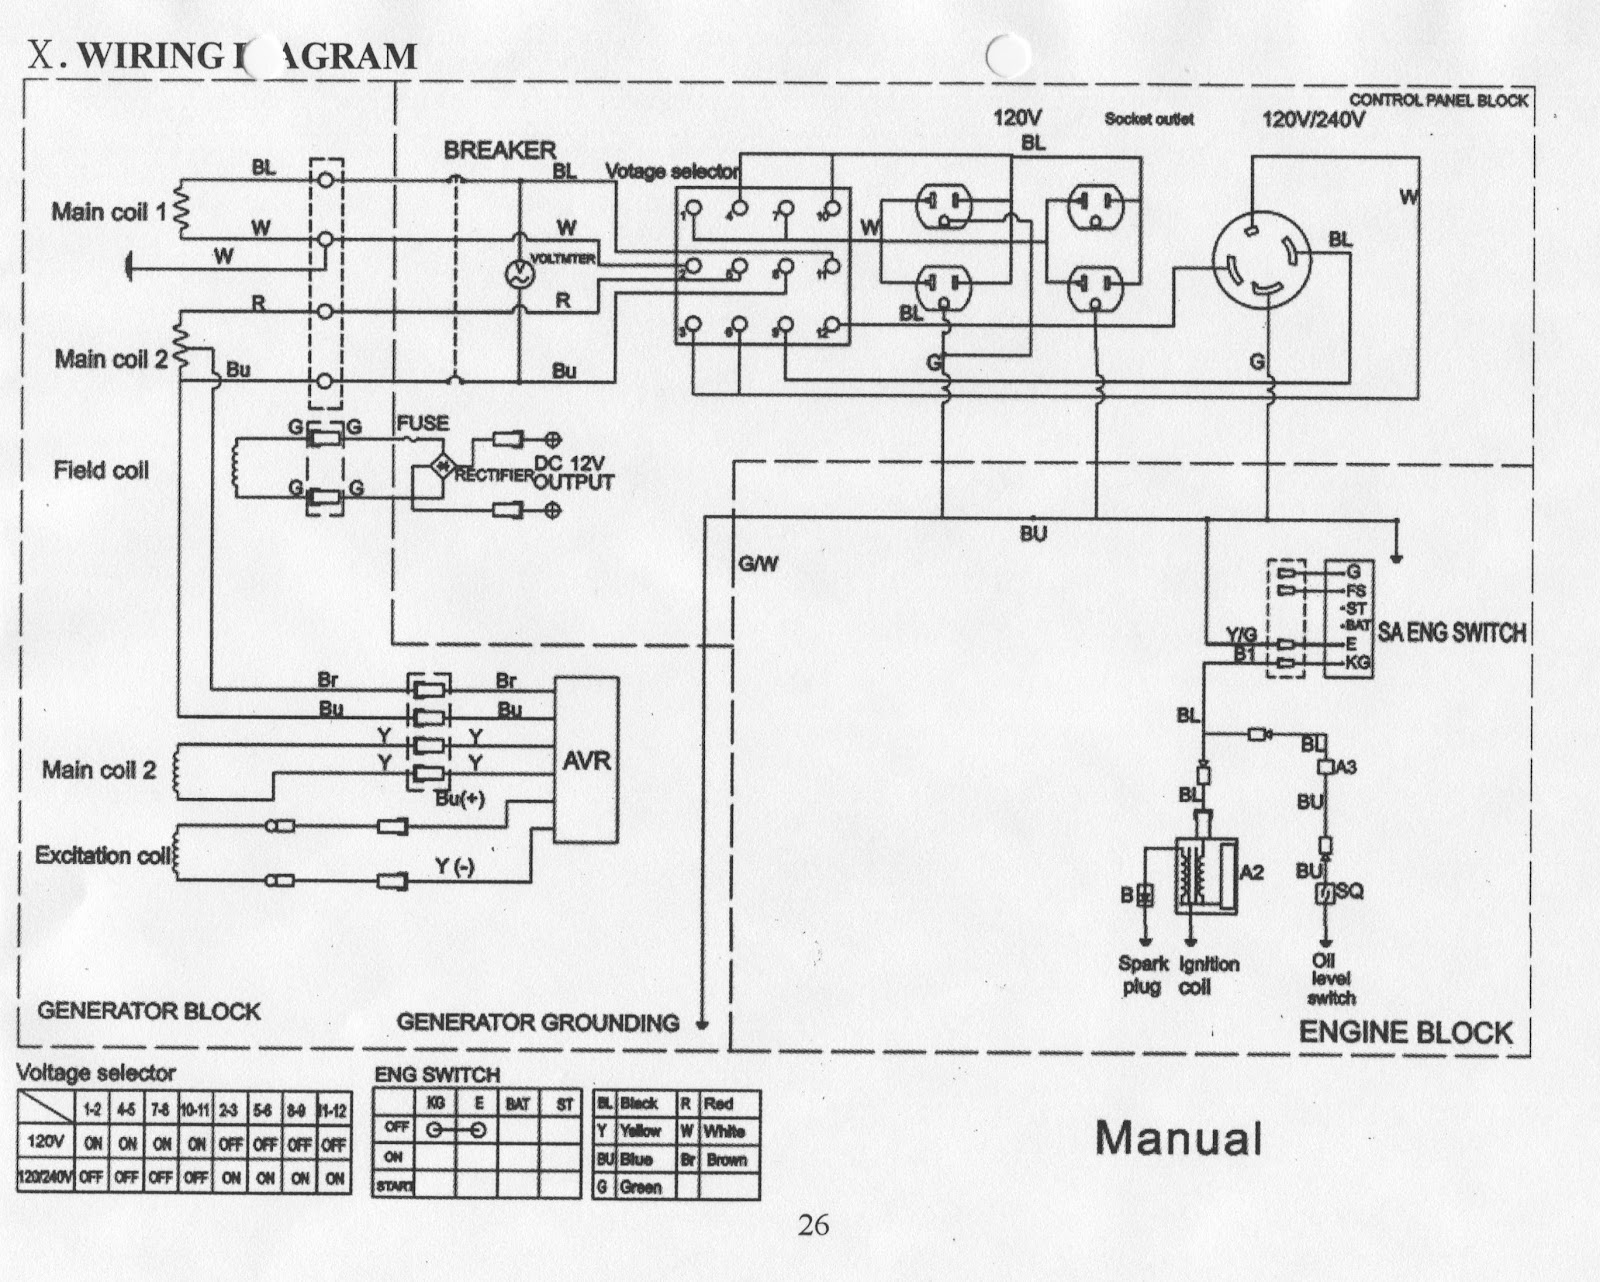 hanma 110cc wiring diagram for [ 1600 x 1282 Pixel ]